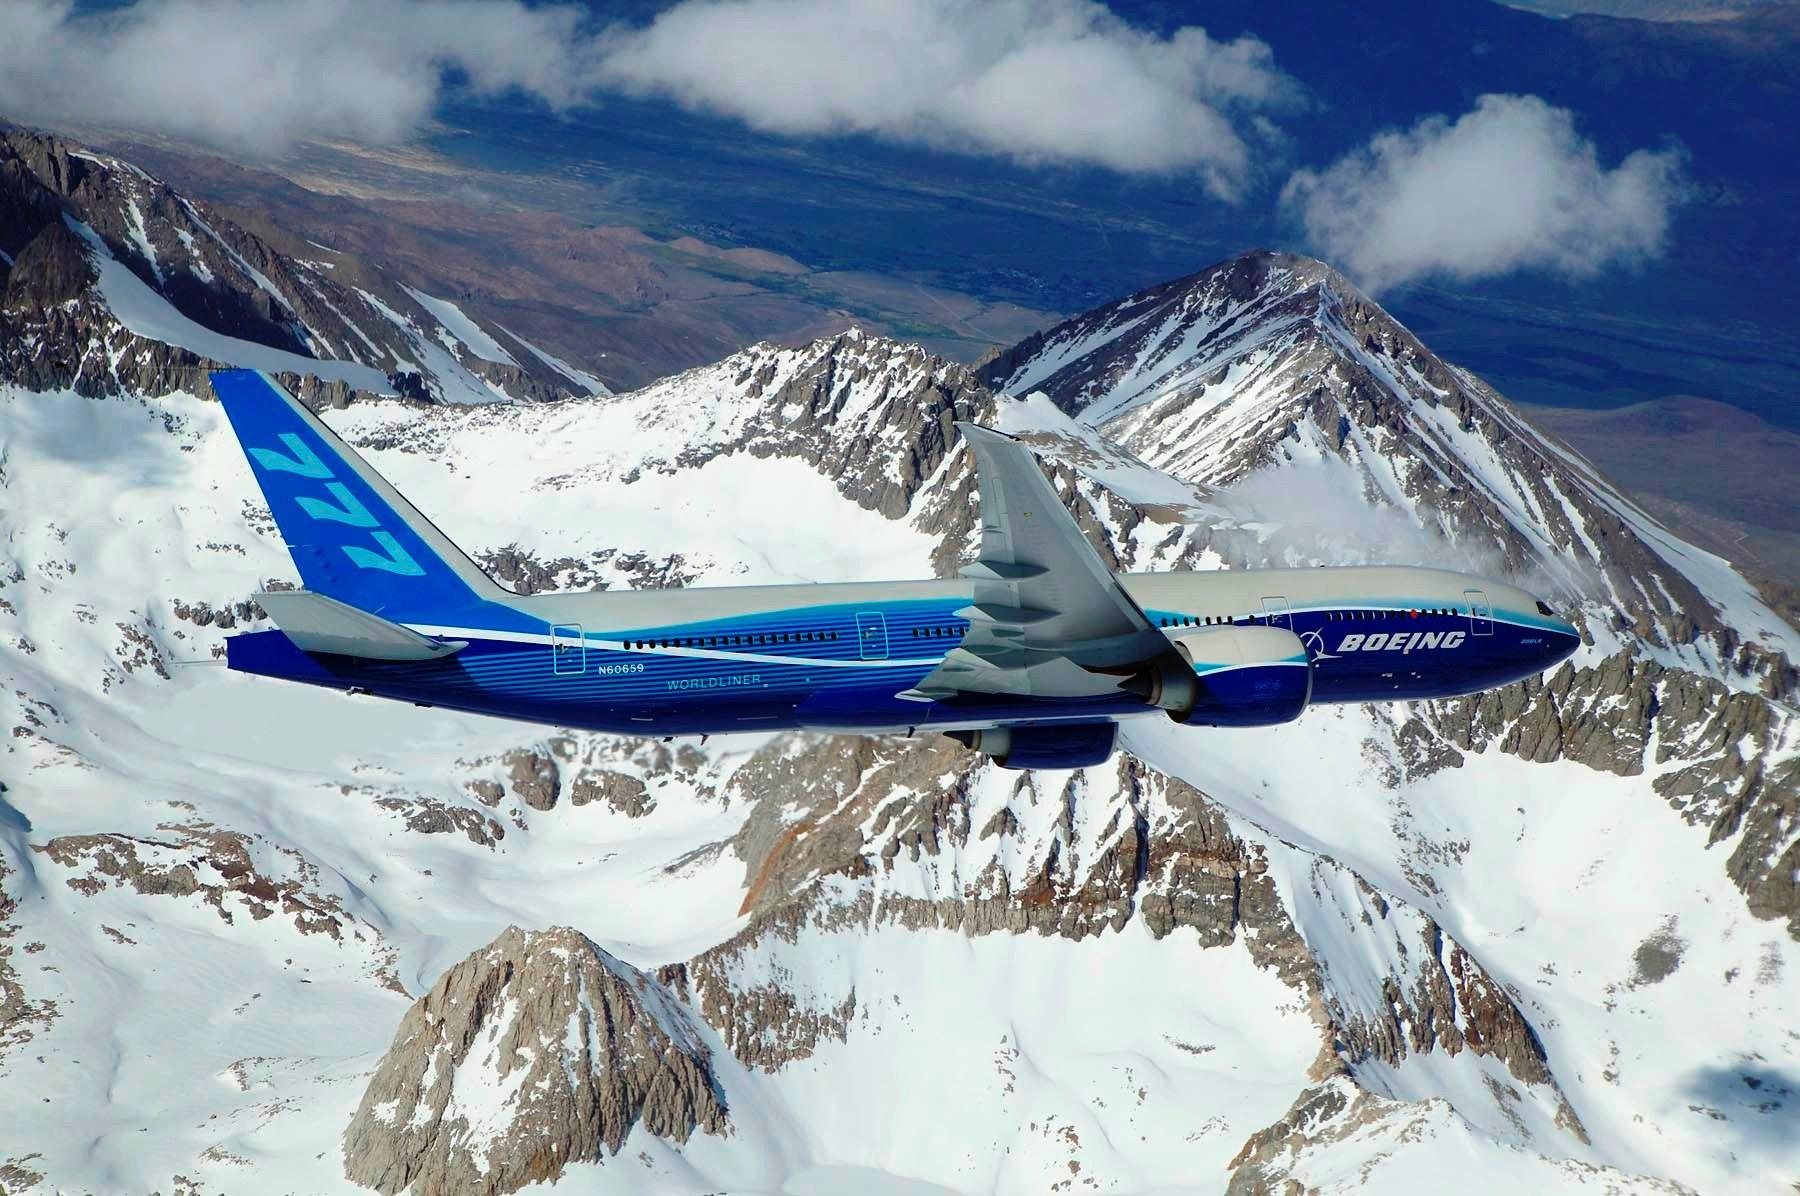 Boeing_777-200LR_banking_over_mountain.jpg